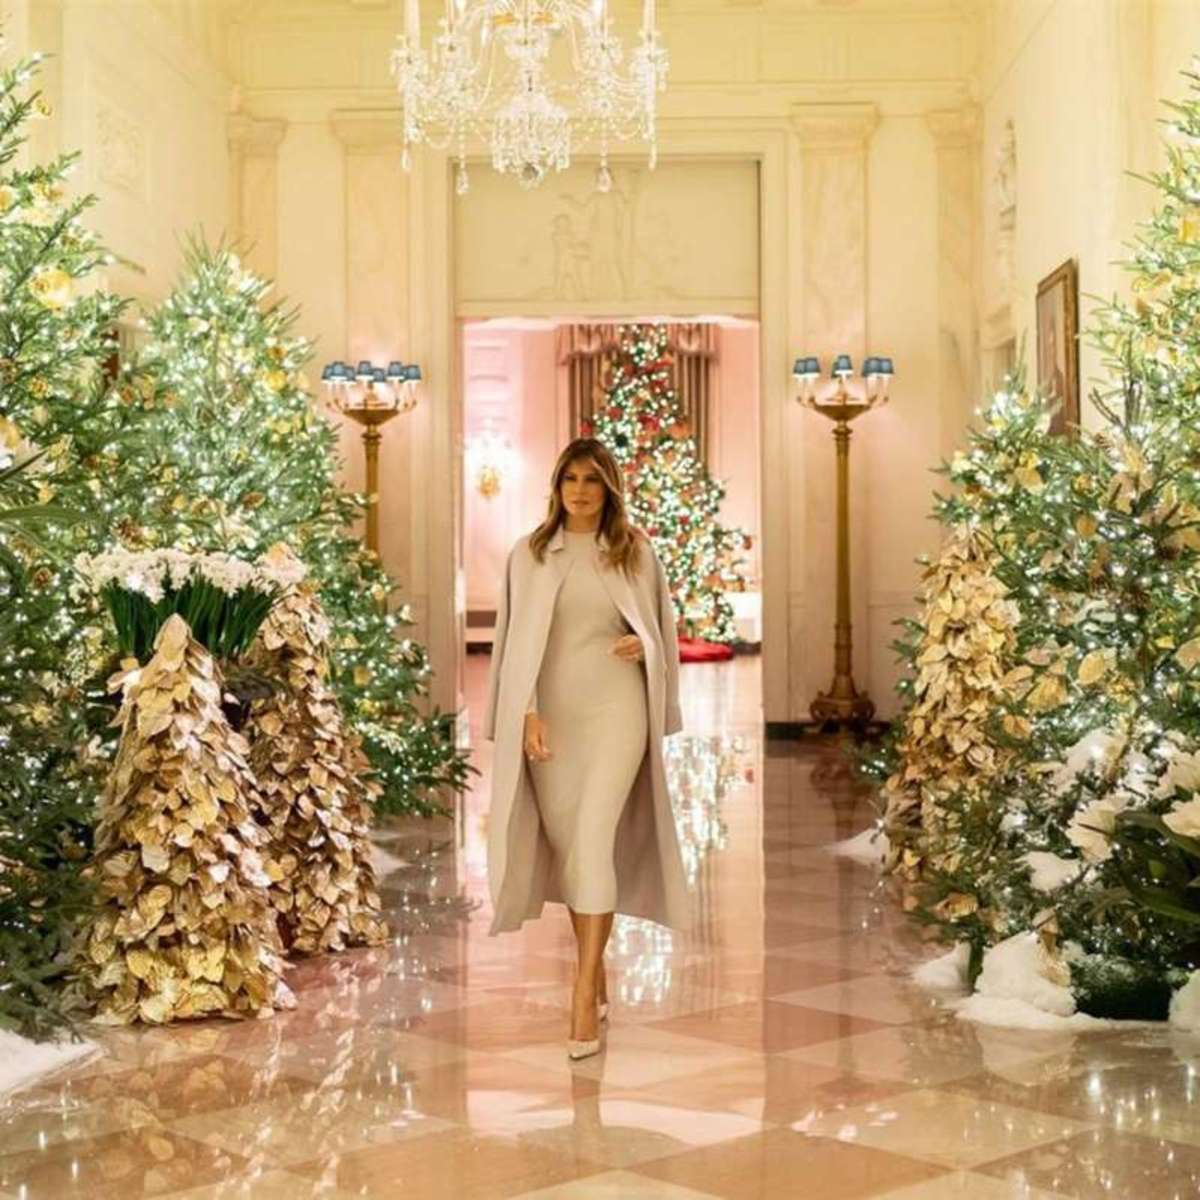 White House at Christmastime 2019